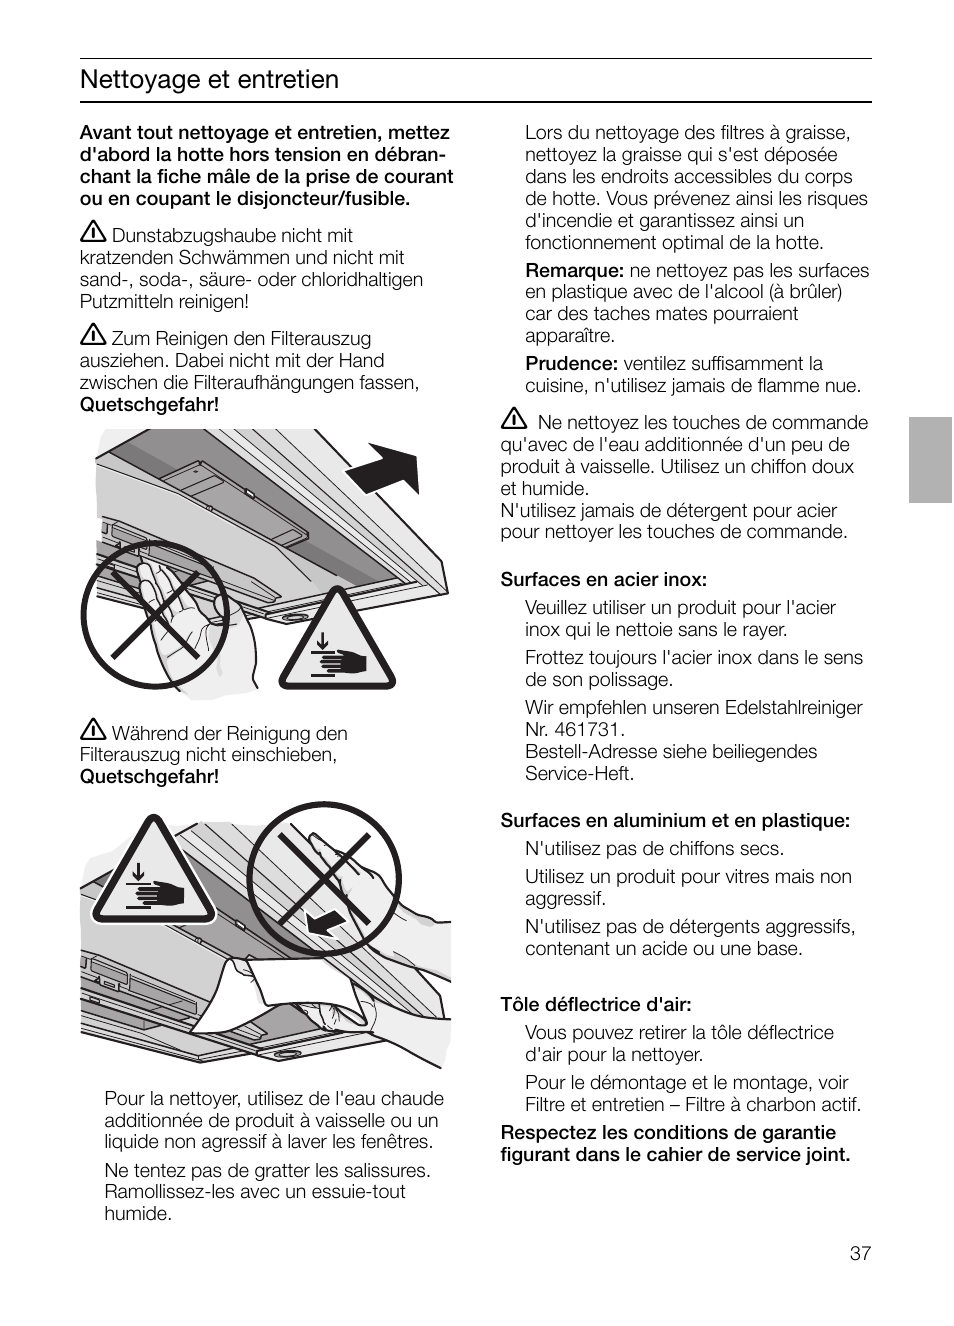 Nettoyage Et Entretien Siemens Lc 957 Aa 70 User Manual Page 37